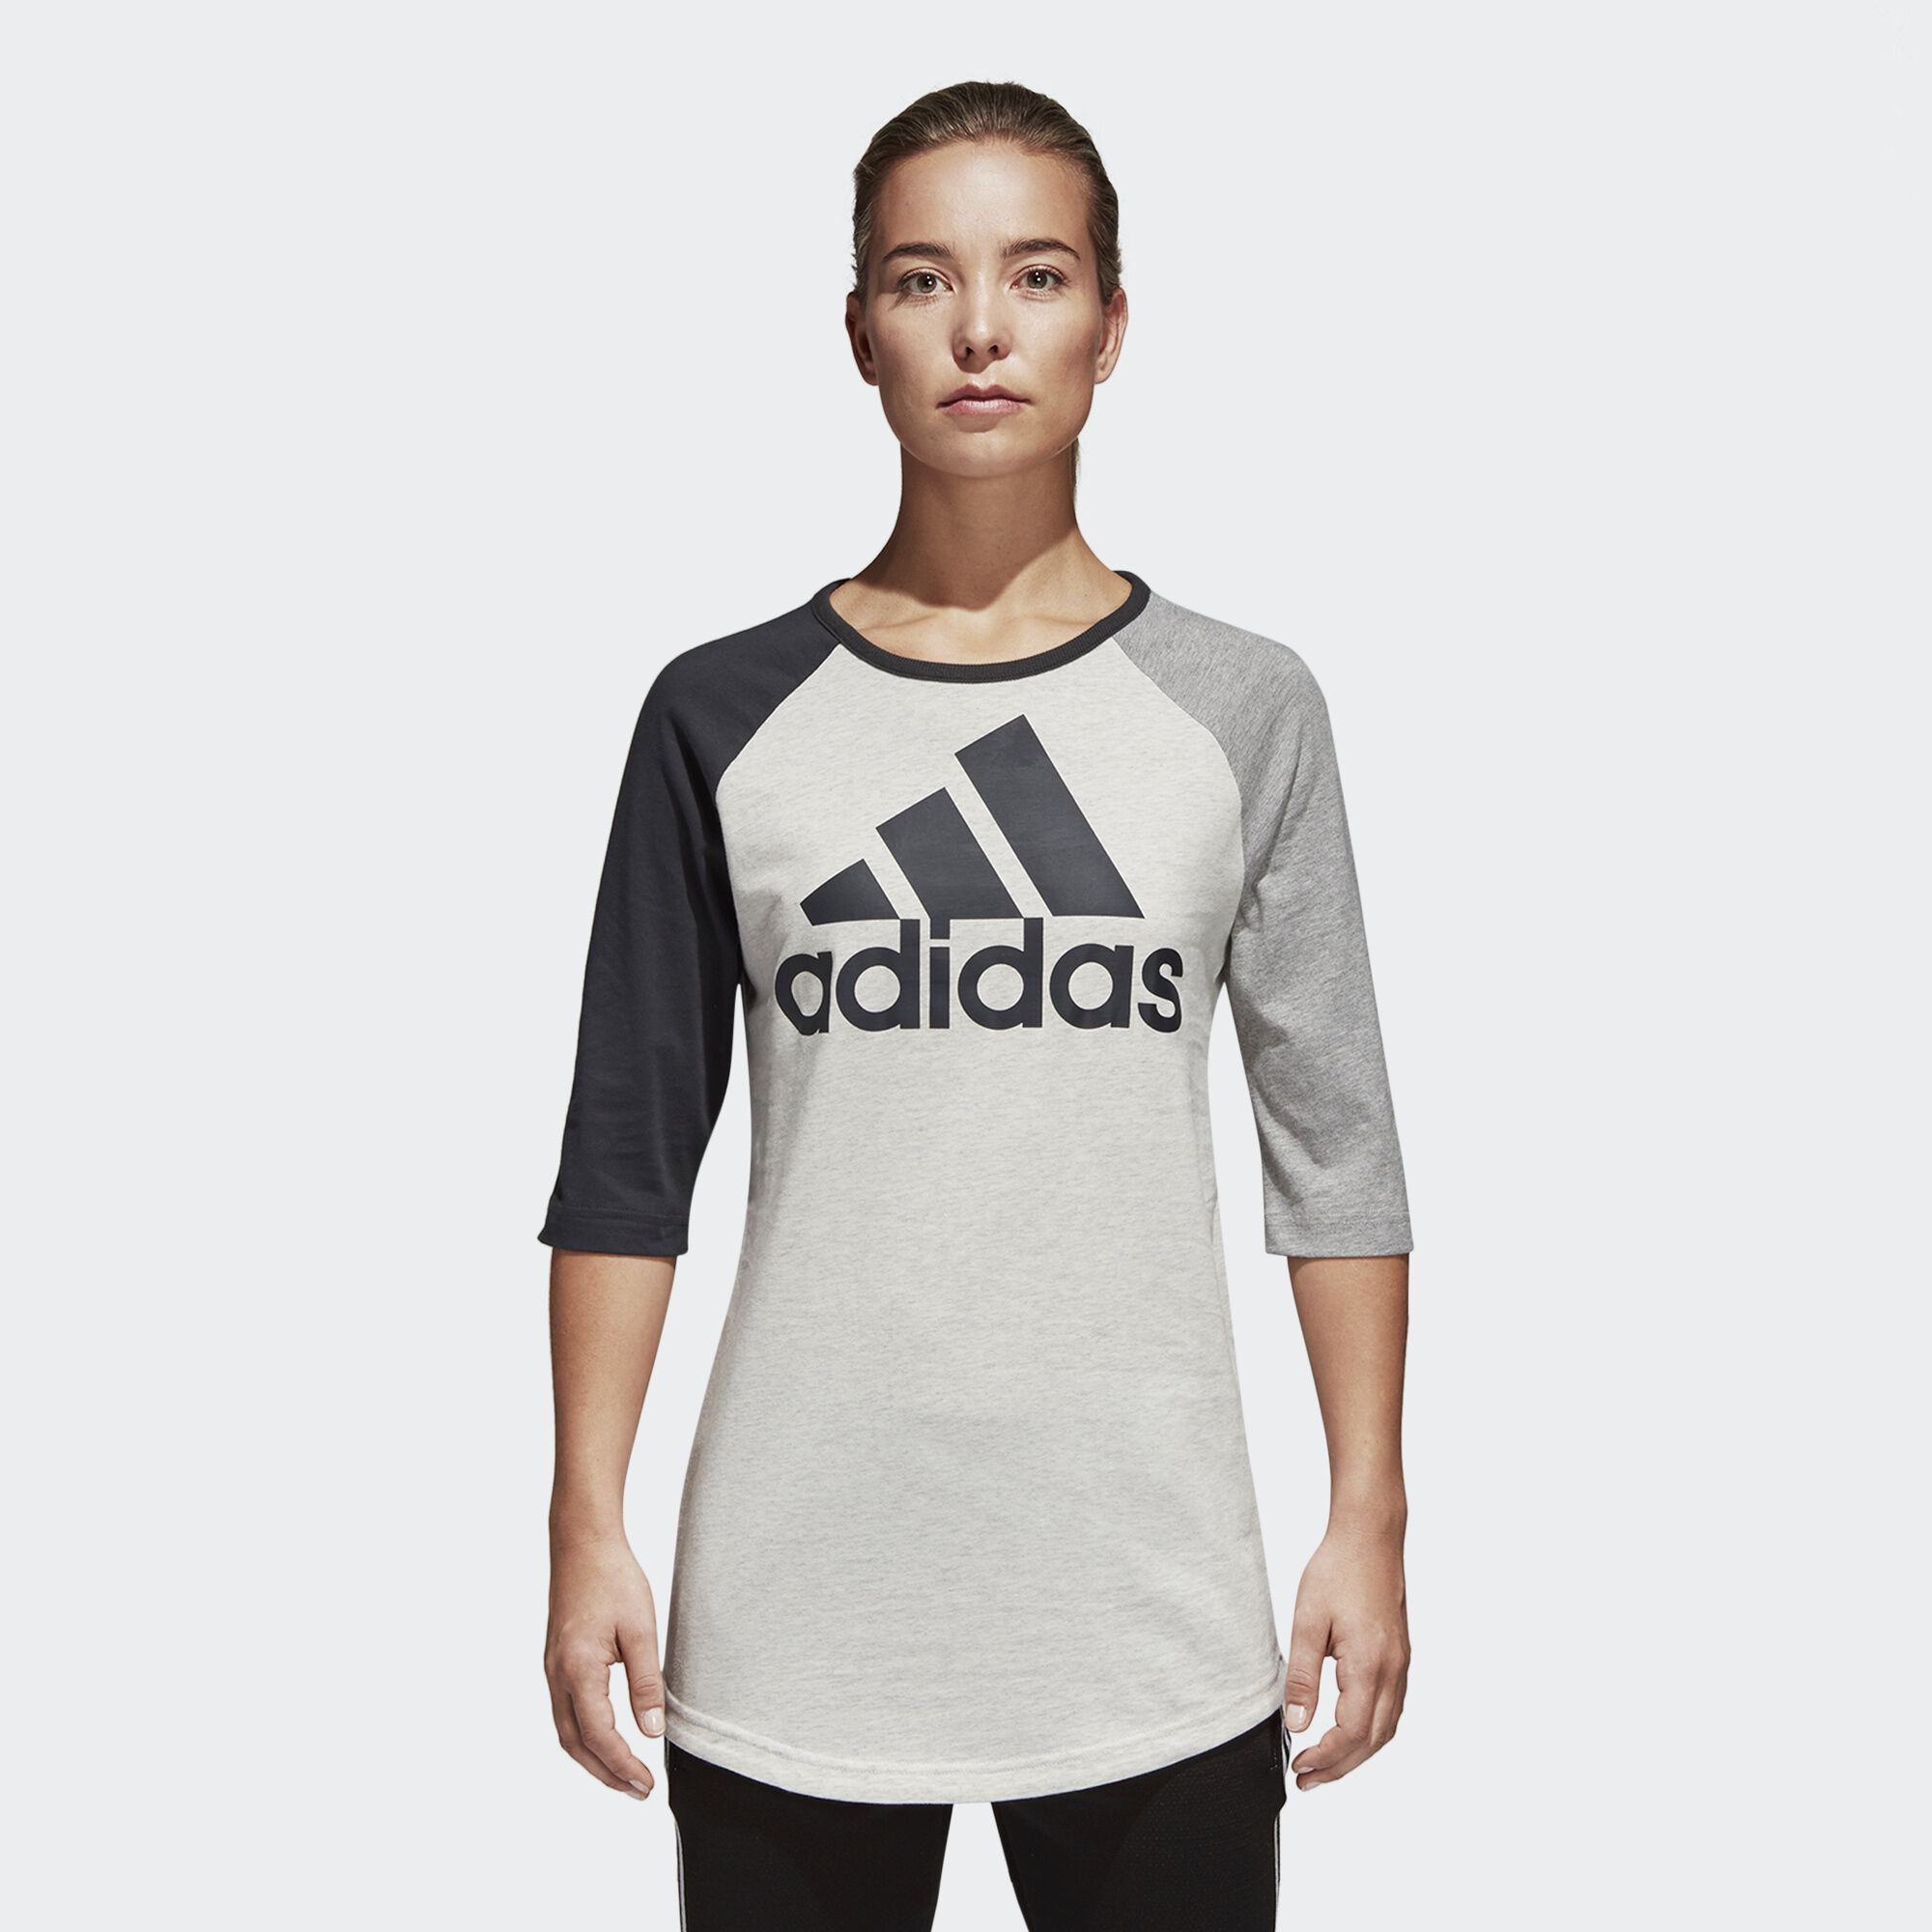 adidas - Sport ID Baseball Tee White Melange CF1428. Women Athletics